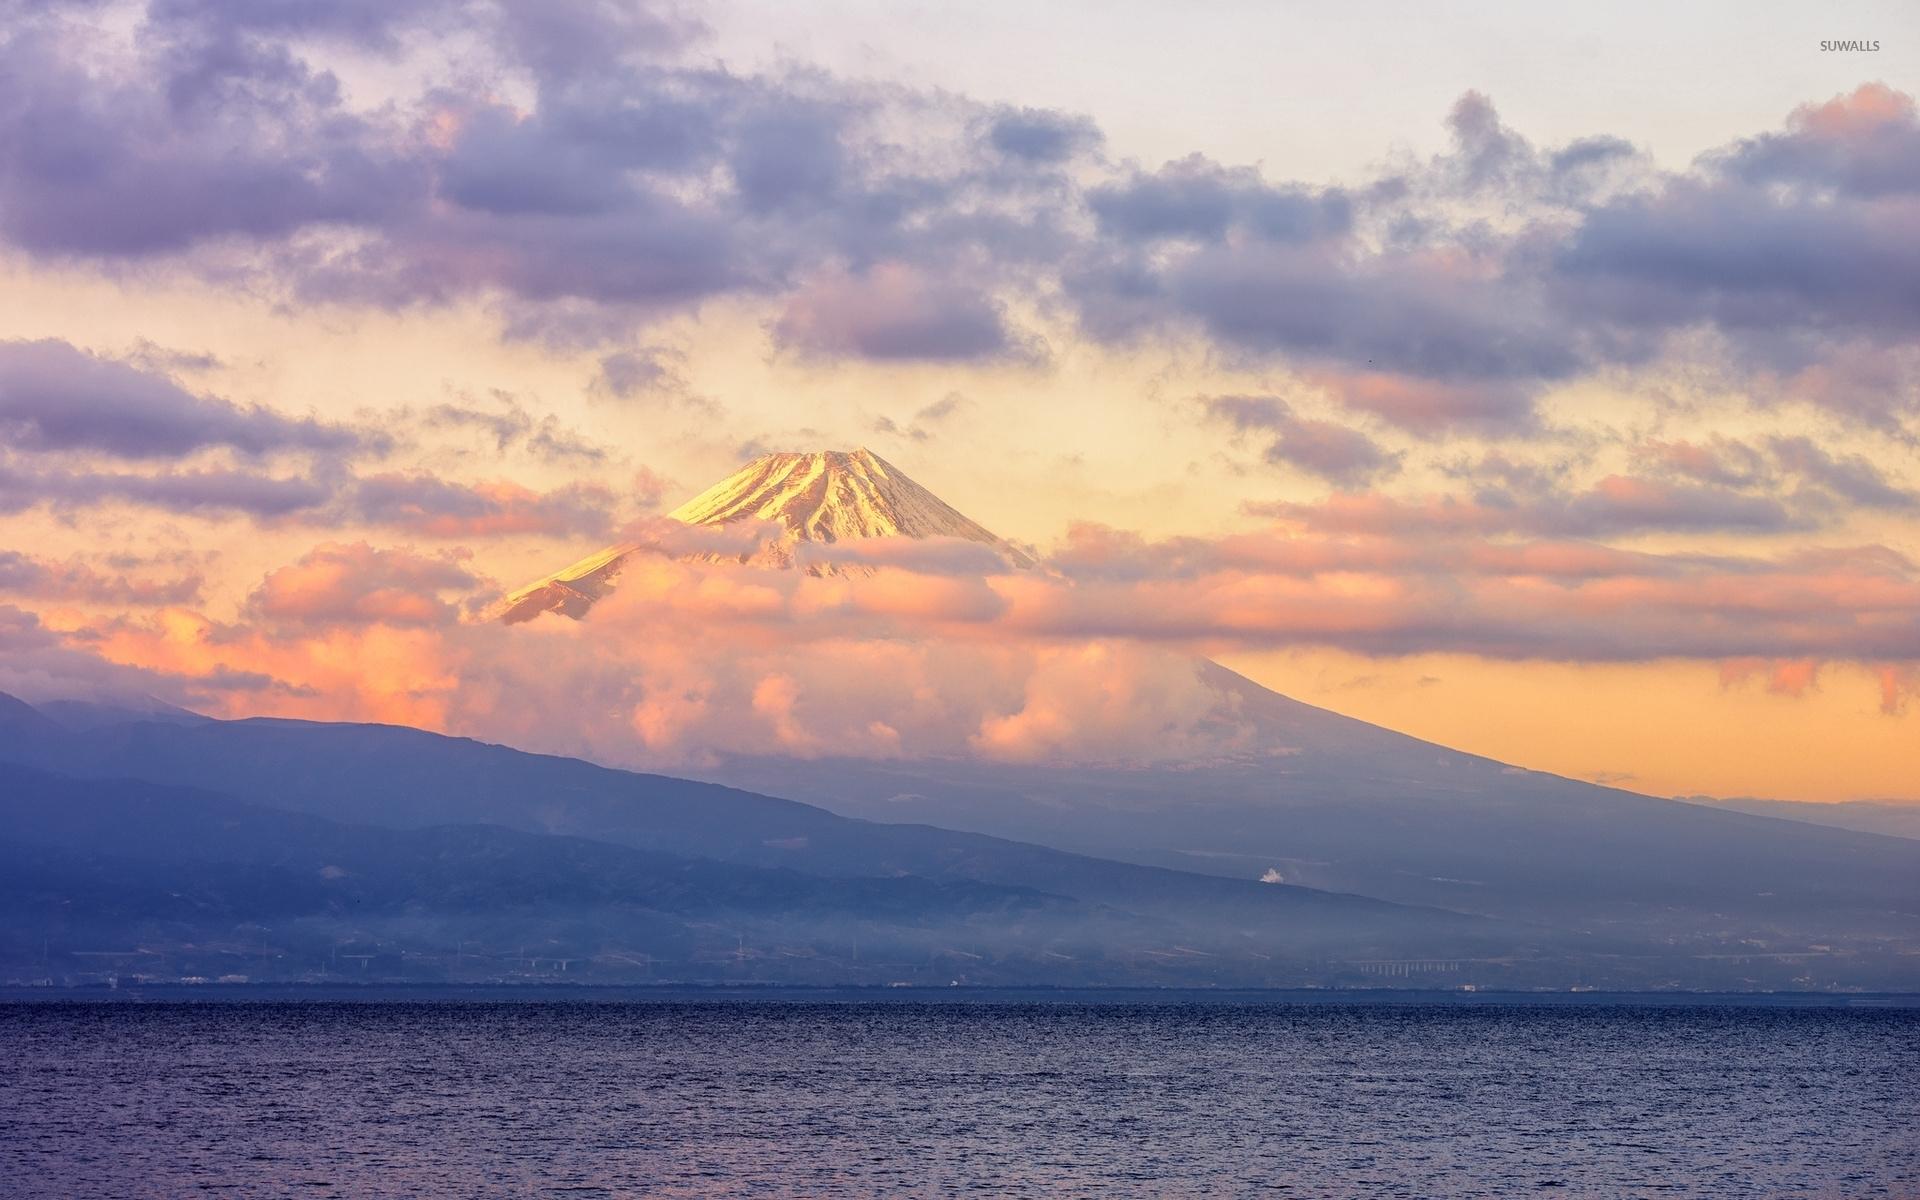 Sunrise Over Mount Fuji Wallpaper Nature Wallpapers 35004